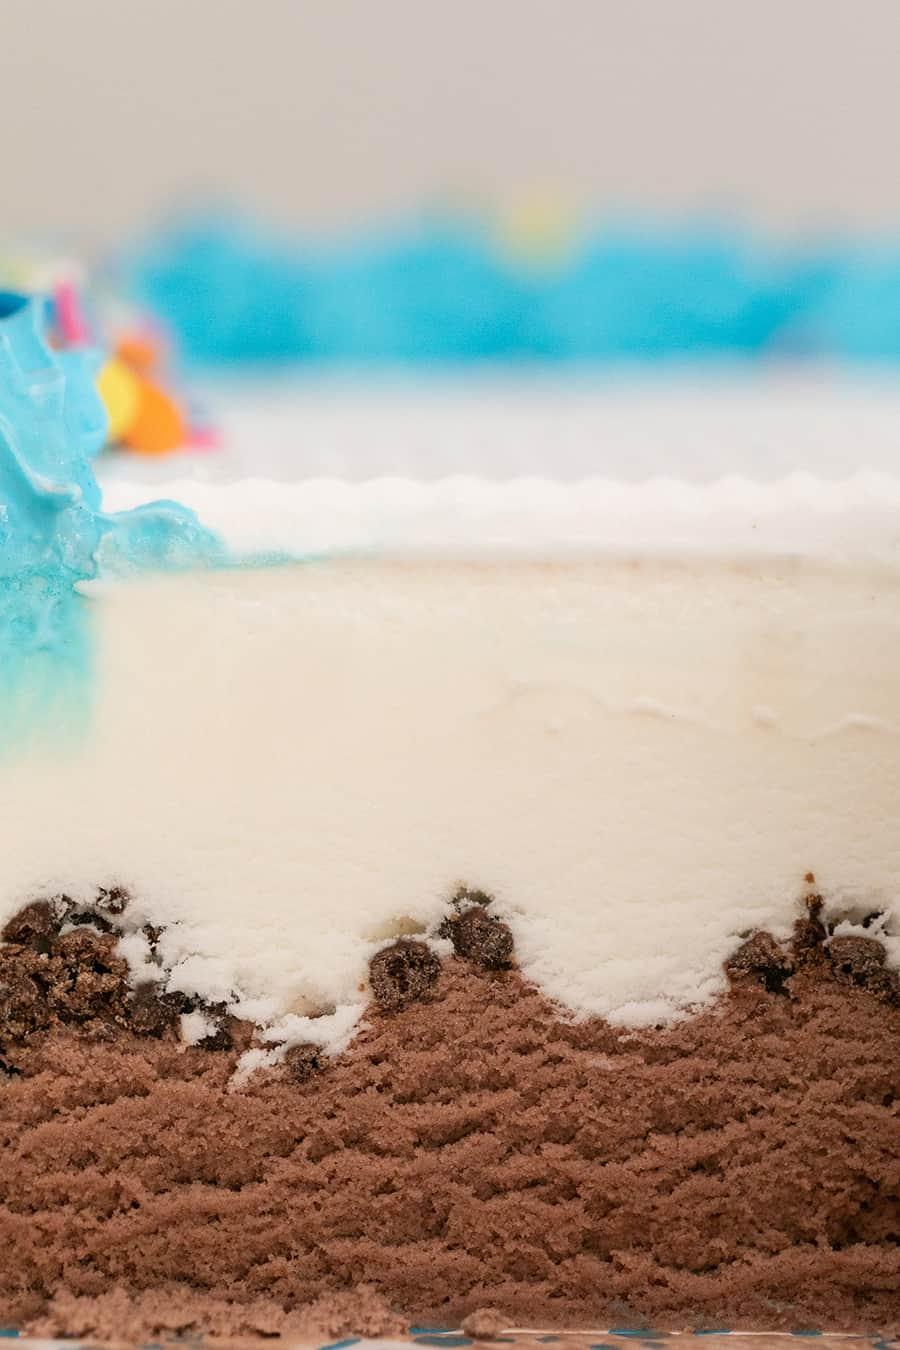 Ice cream cake close up